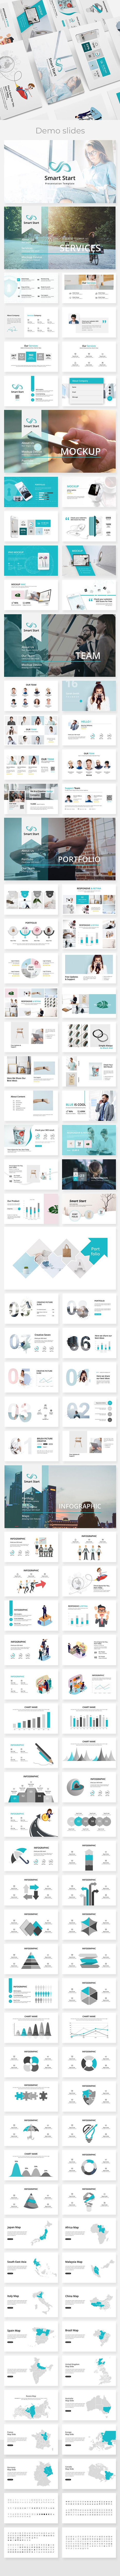 Smart Start - Multipurpose Powerpoint Template - Pitch Deck PowerPoint Templates